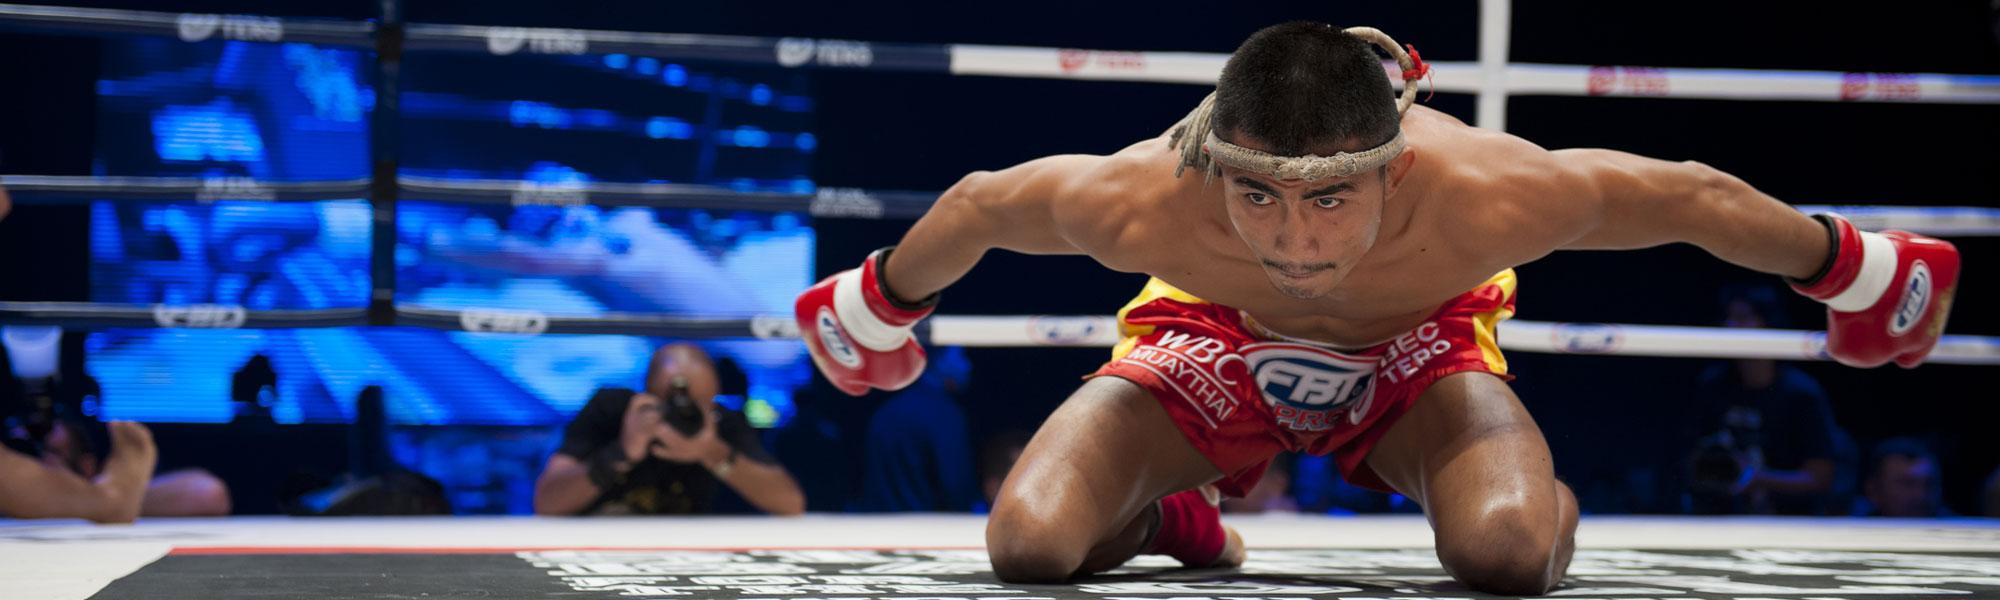 Muay Thai Gym in Bangkok